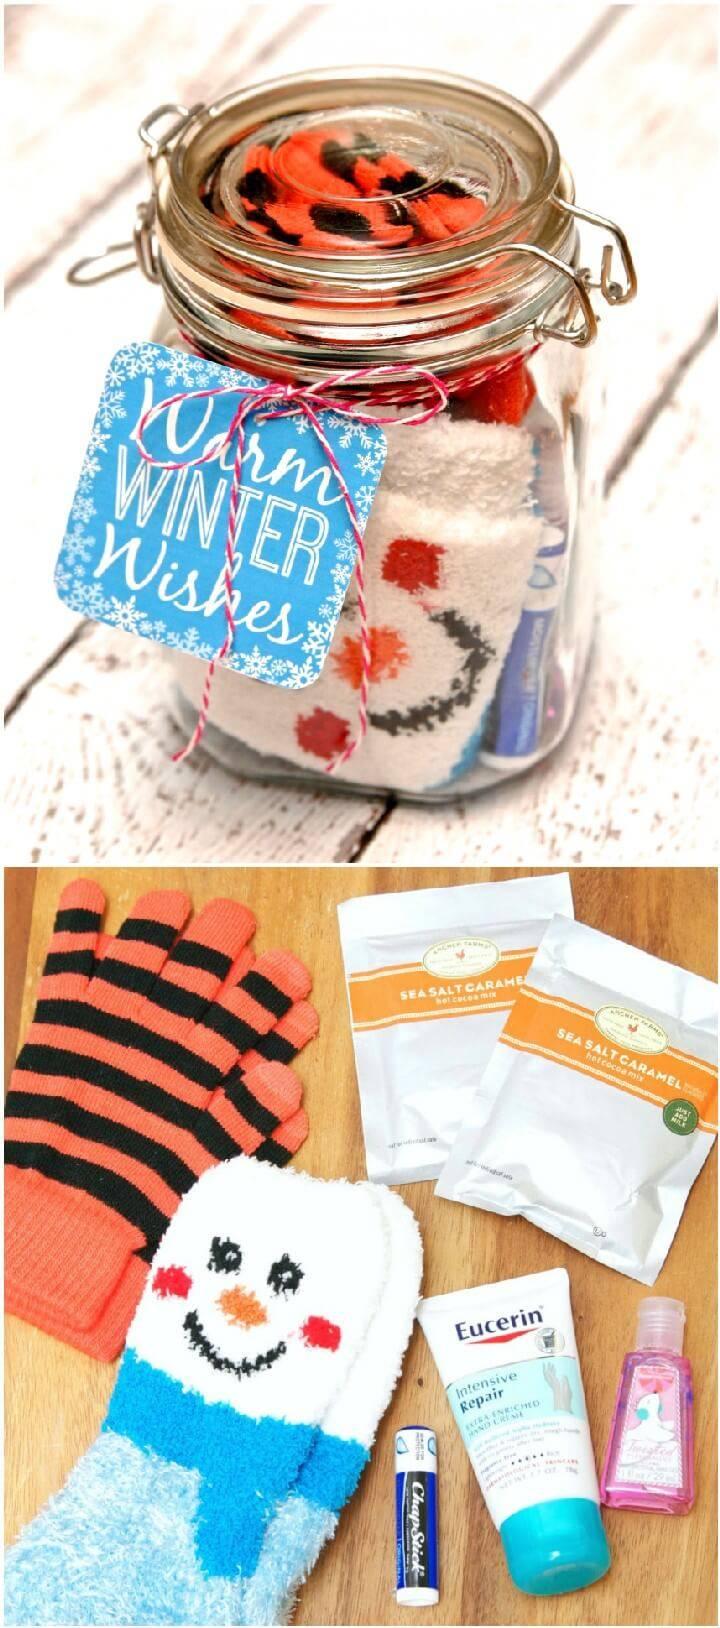 DIY Winter Survival Kit in Mason Jar Gift